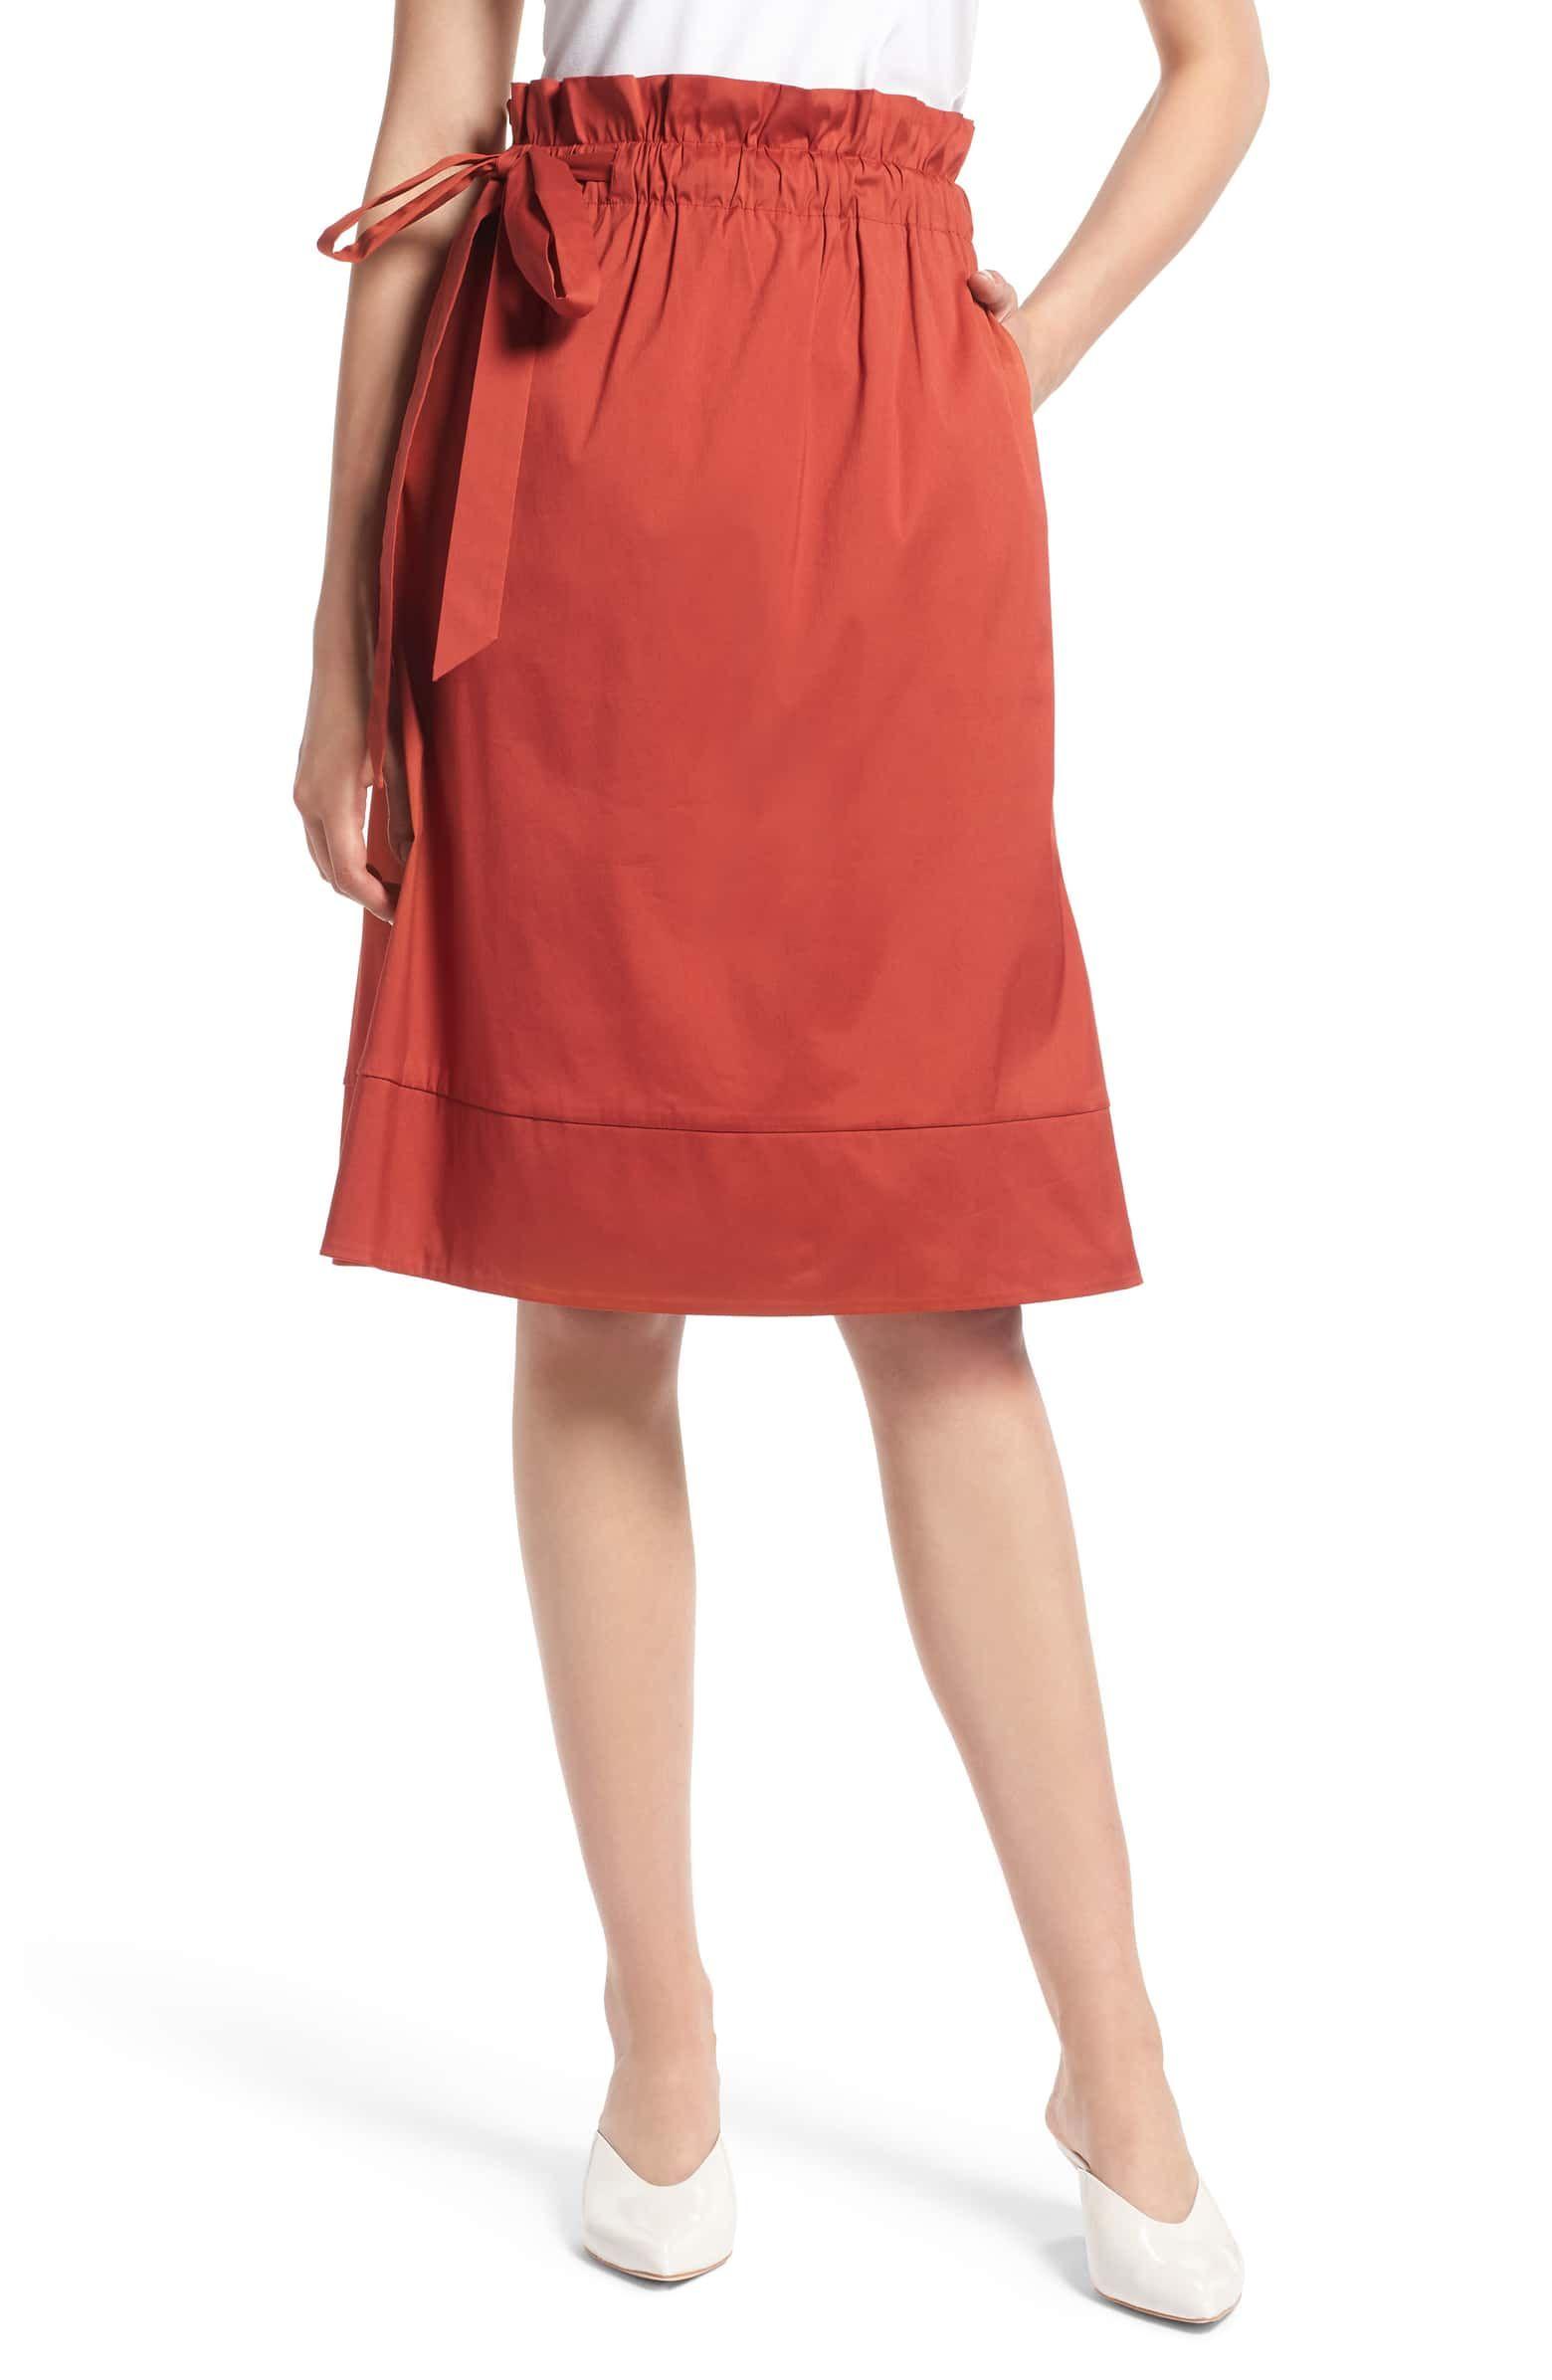 Petite rust skirt #7